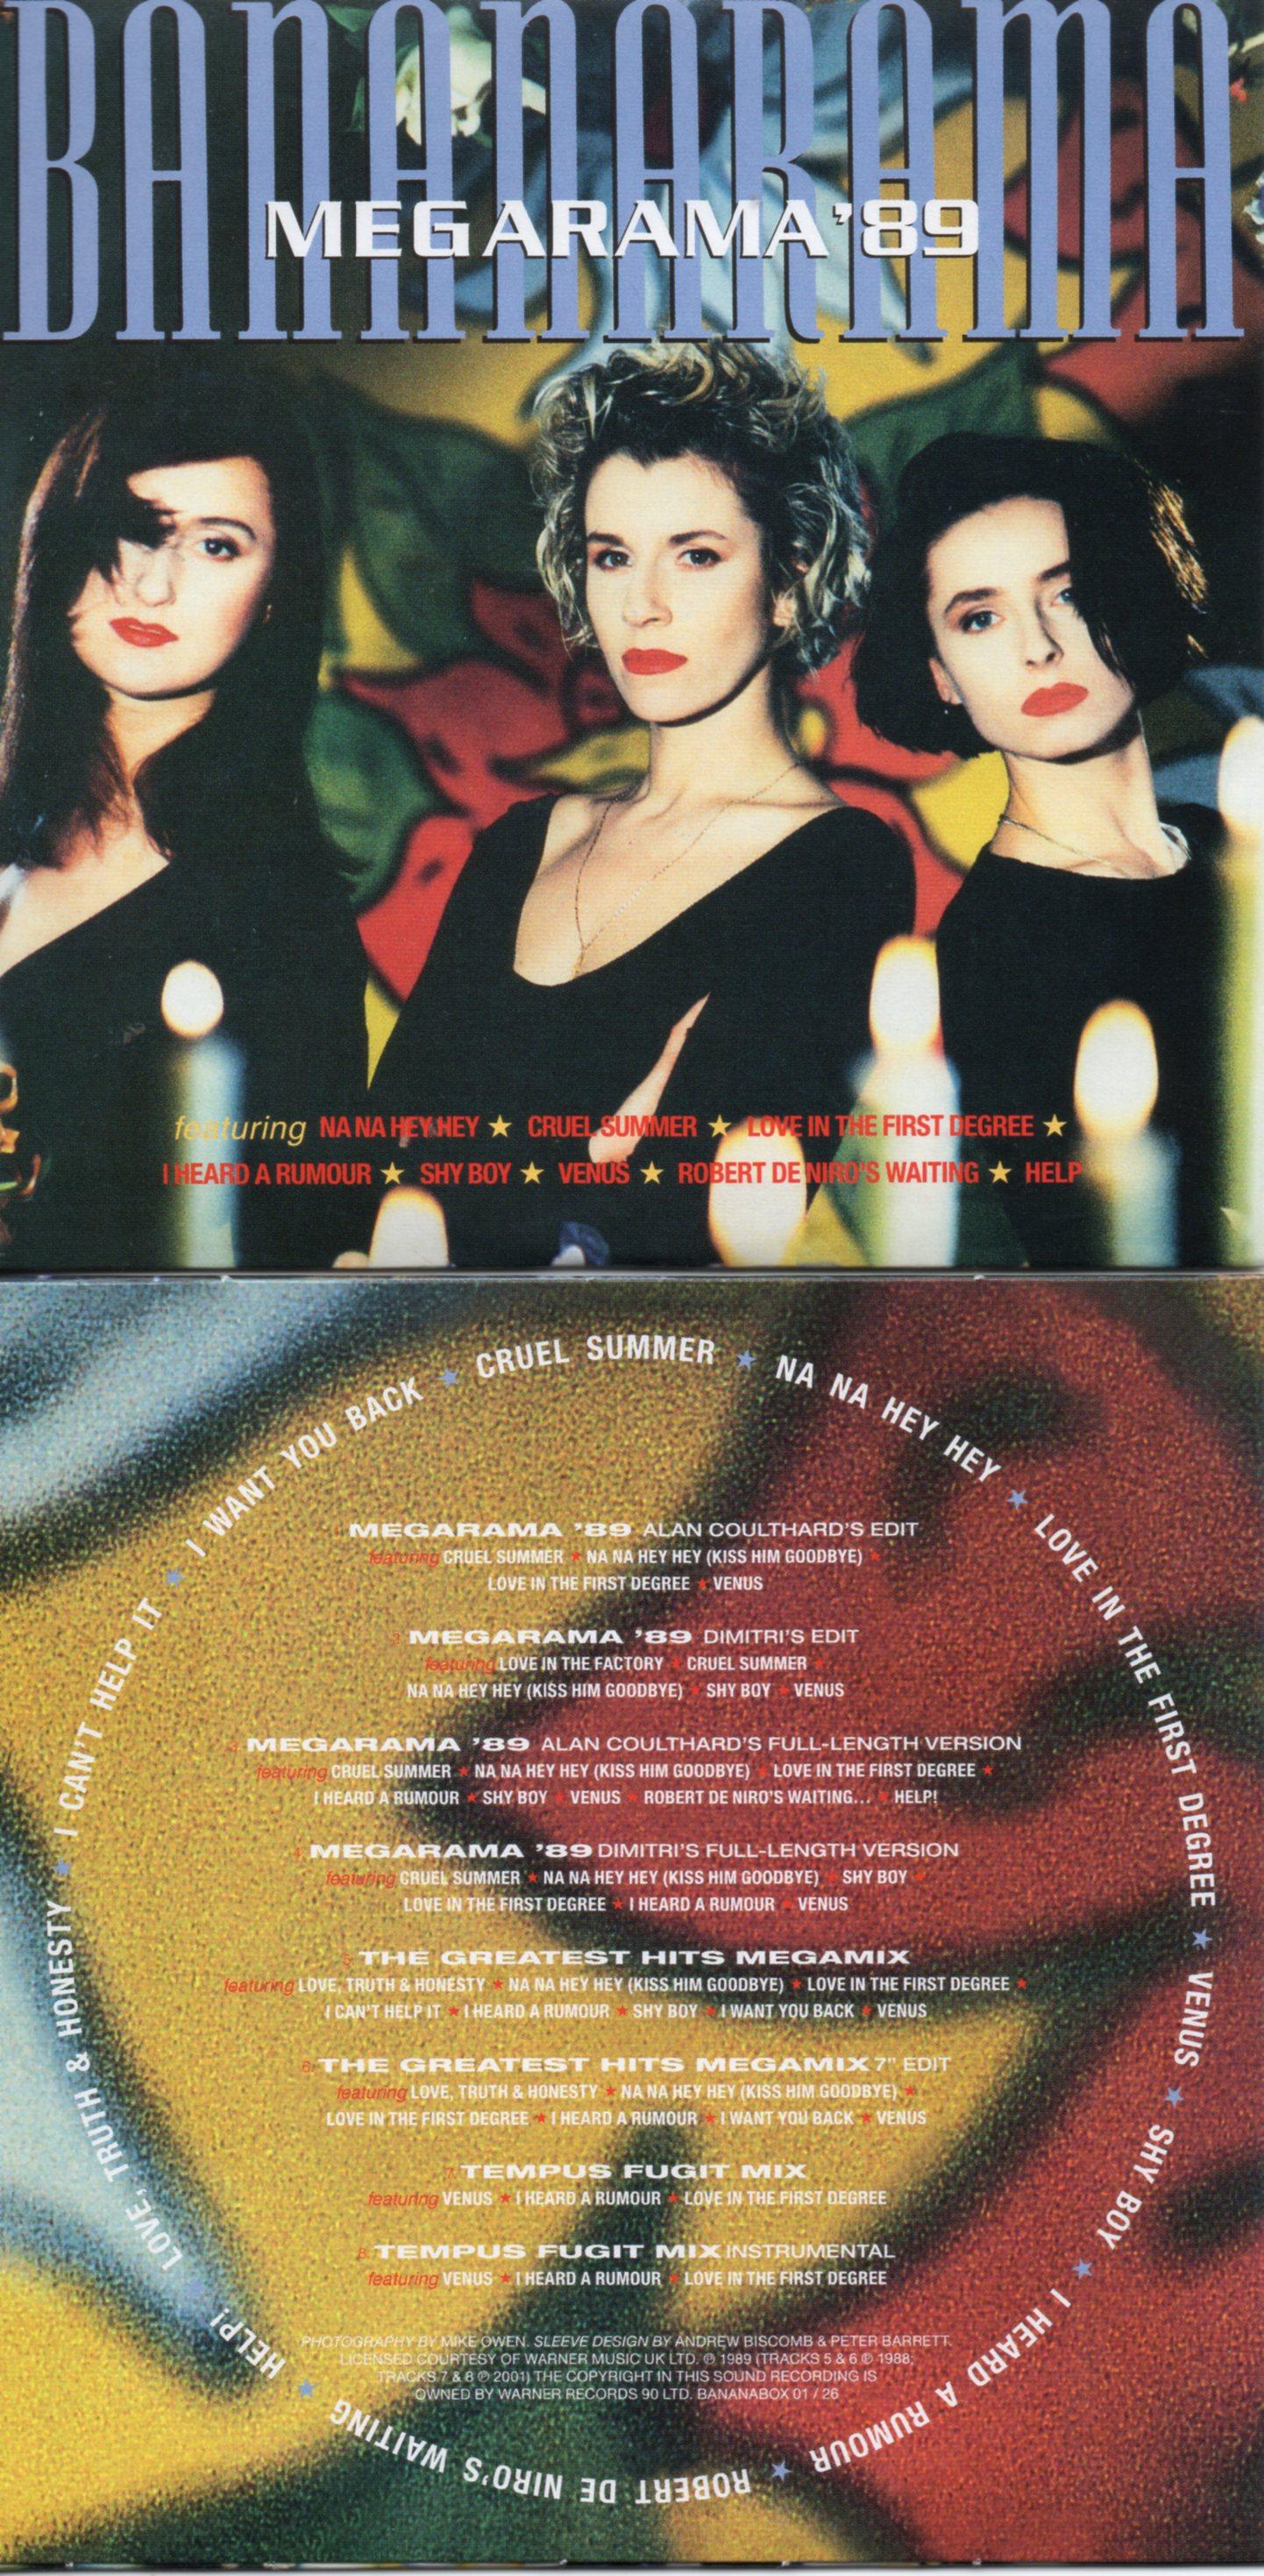 BANANARAMA - MEGARAMA '89 (1989) 8-TRACK CARD SLEEVE - CD single